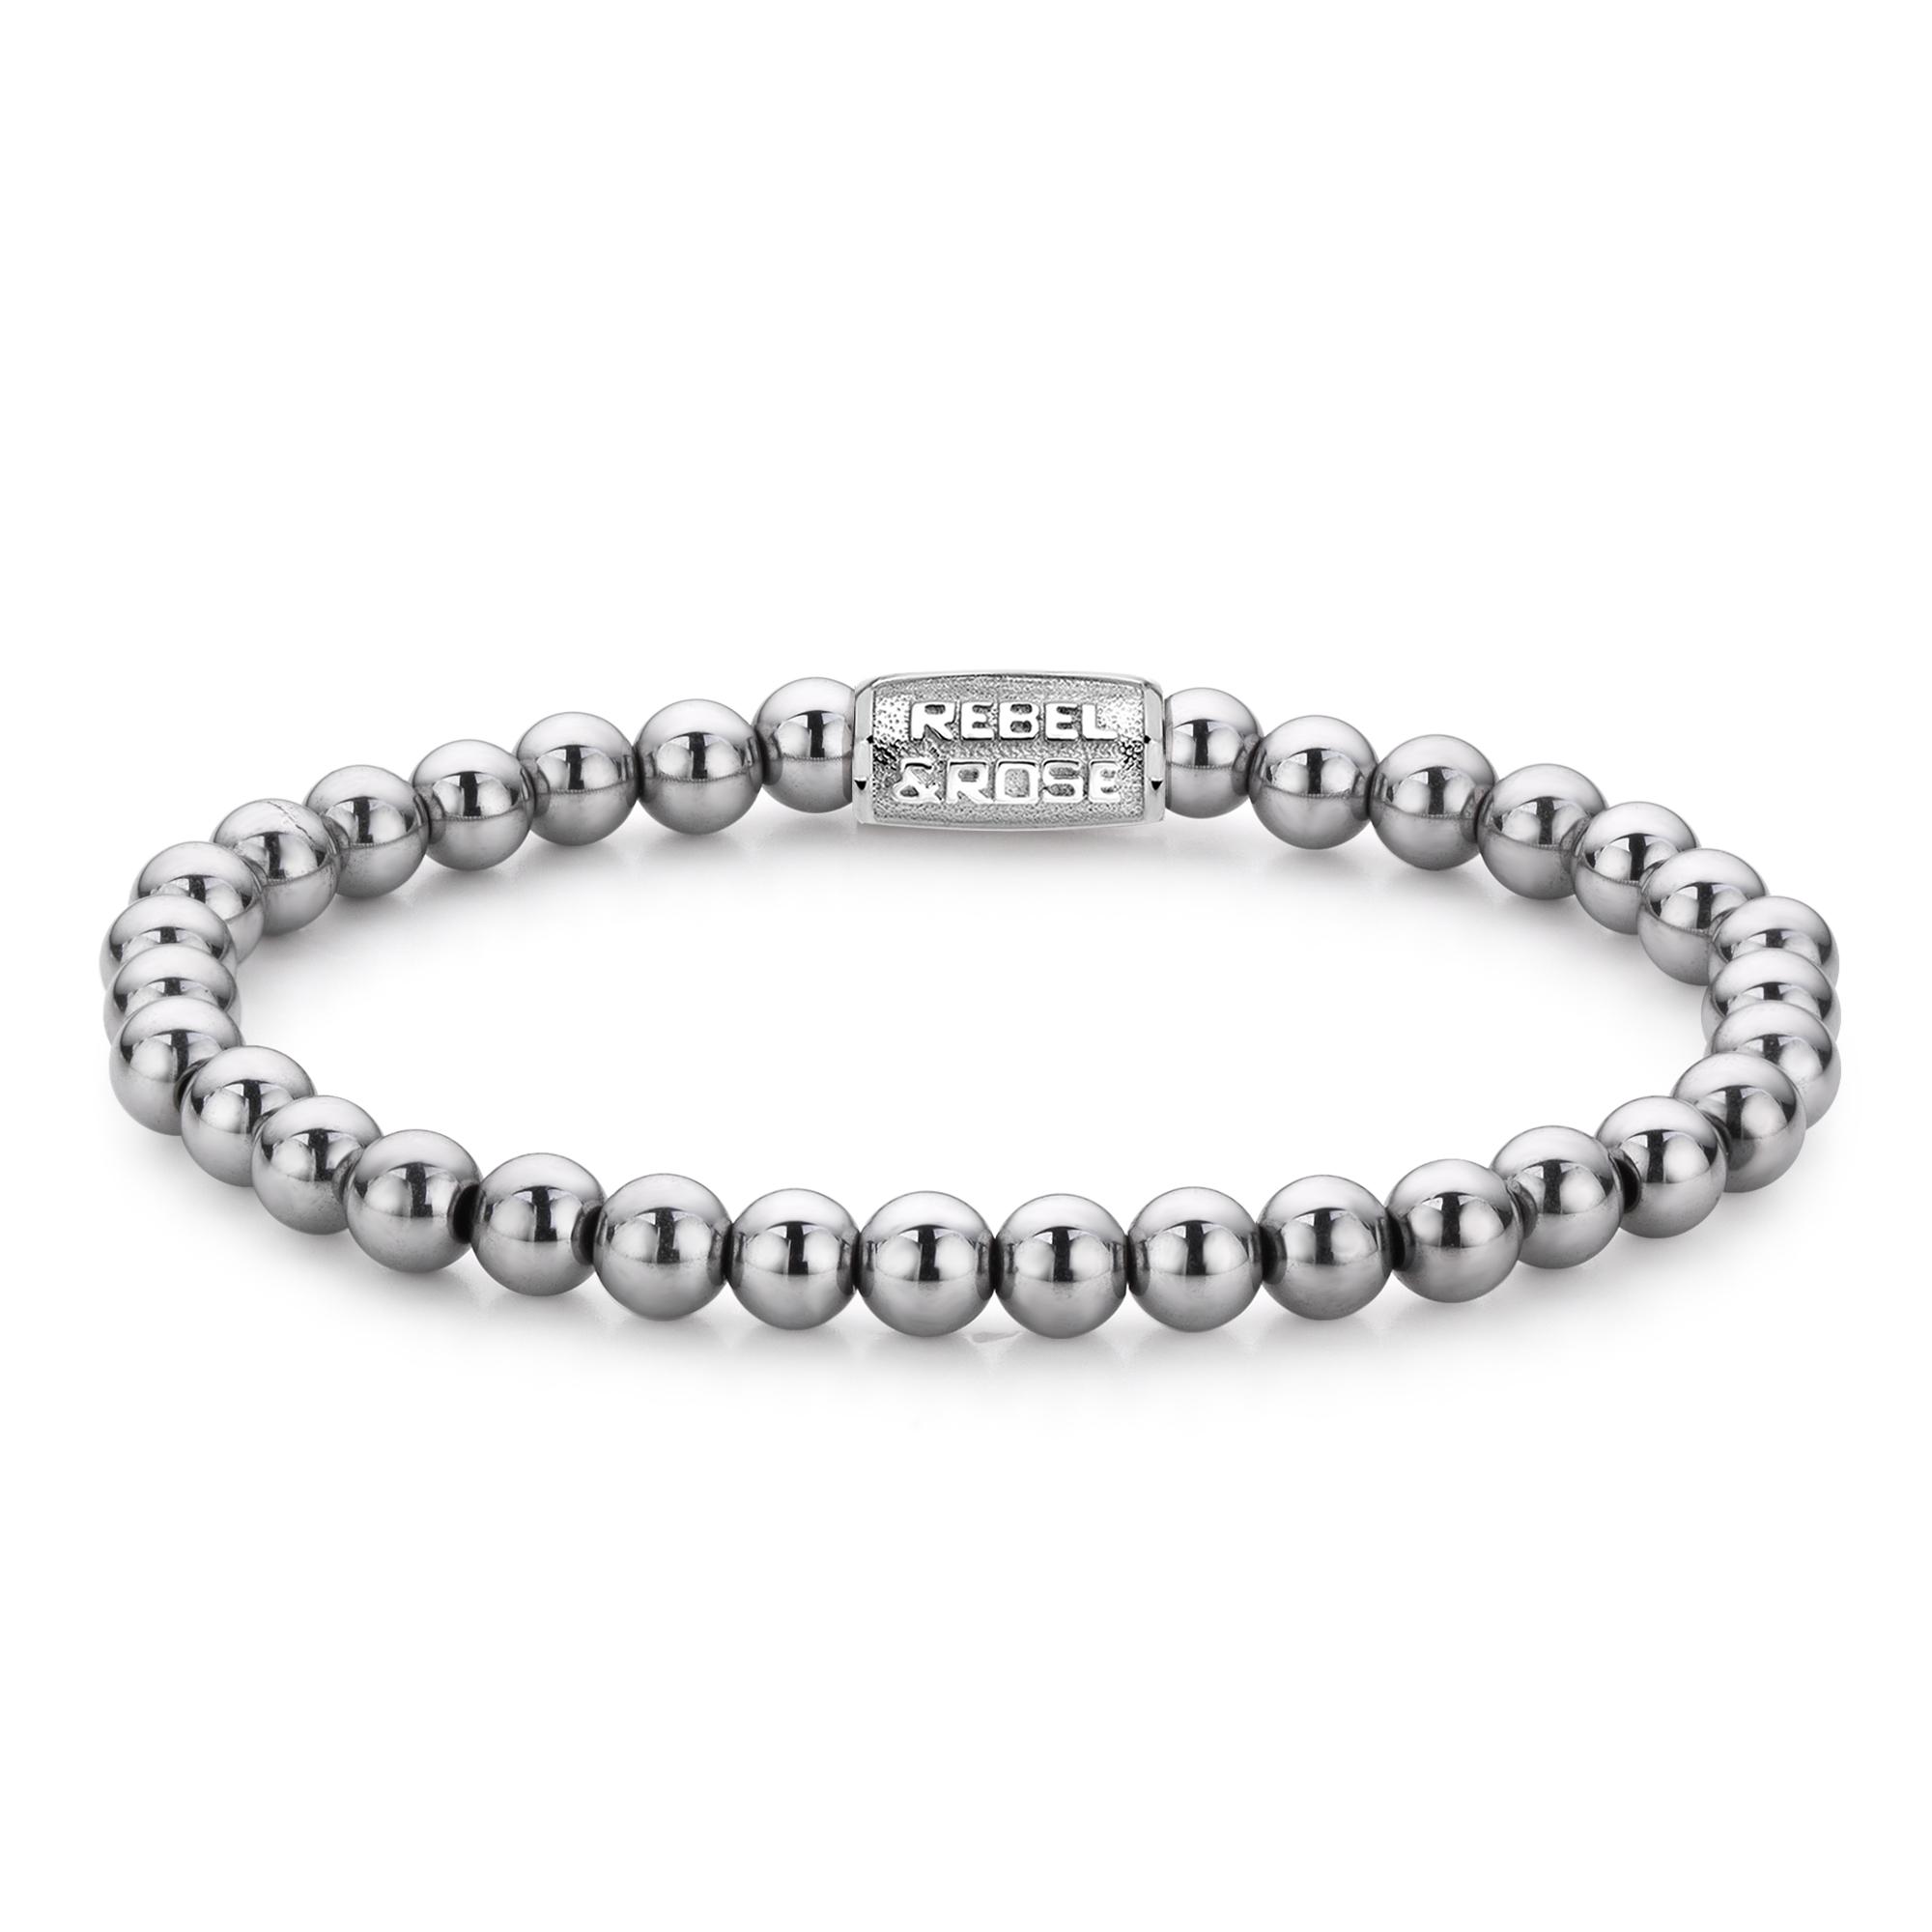 Rebel and Rose RR 60020 S Rekarmband Beads Silver Shine zilverkleurig 6 mm XS 15 cm